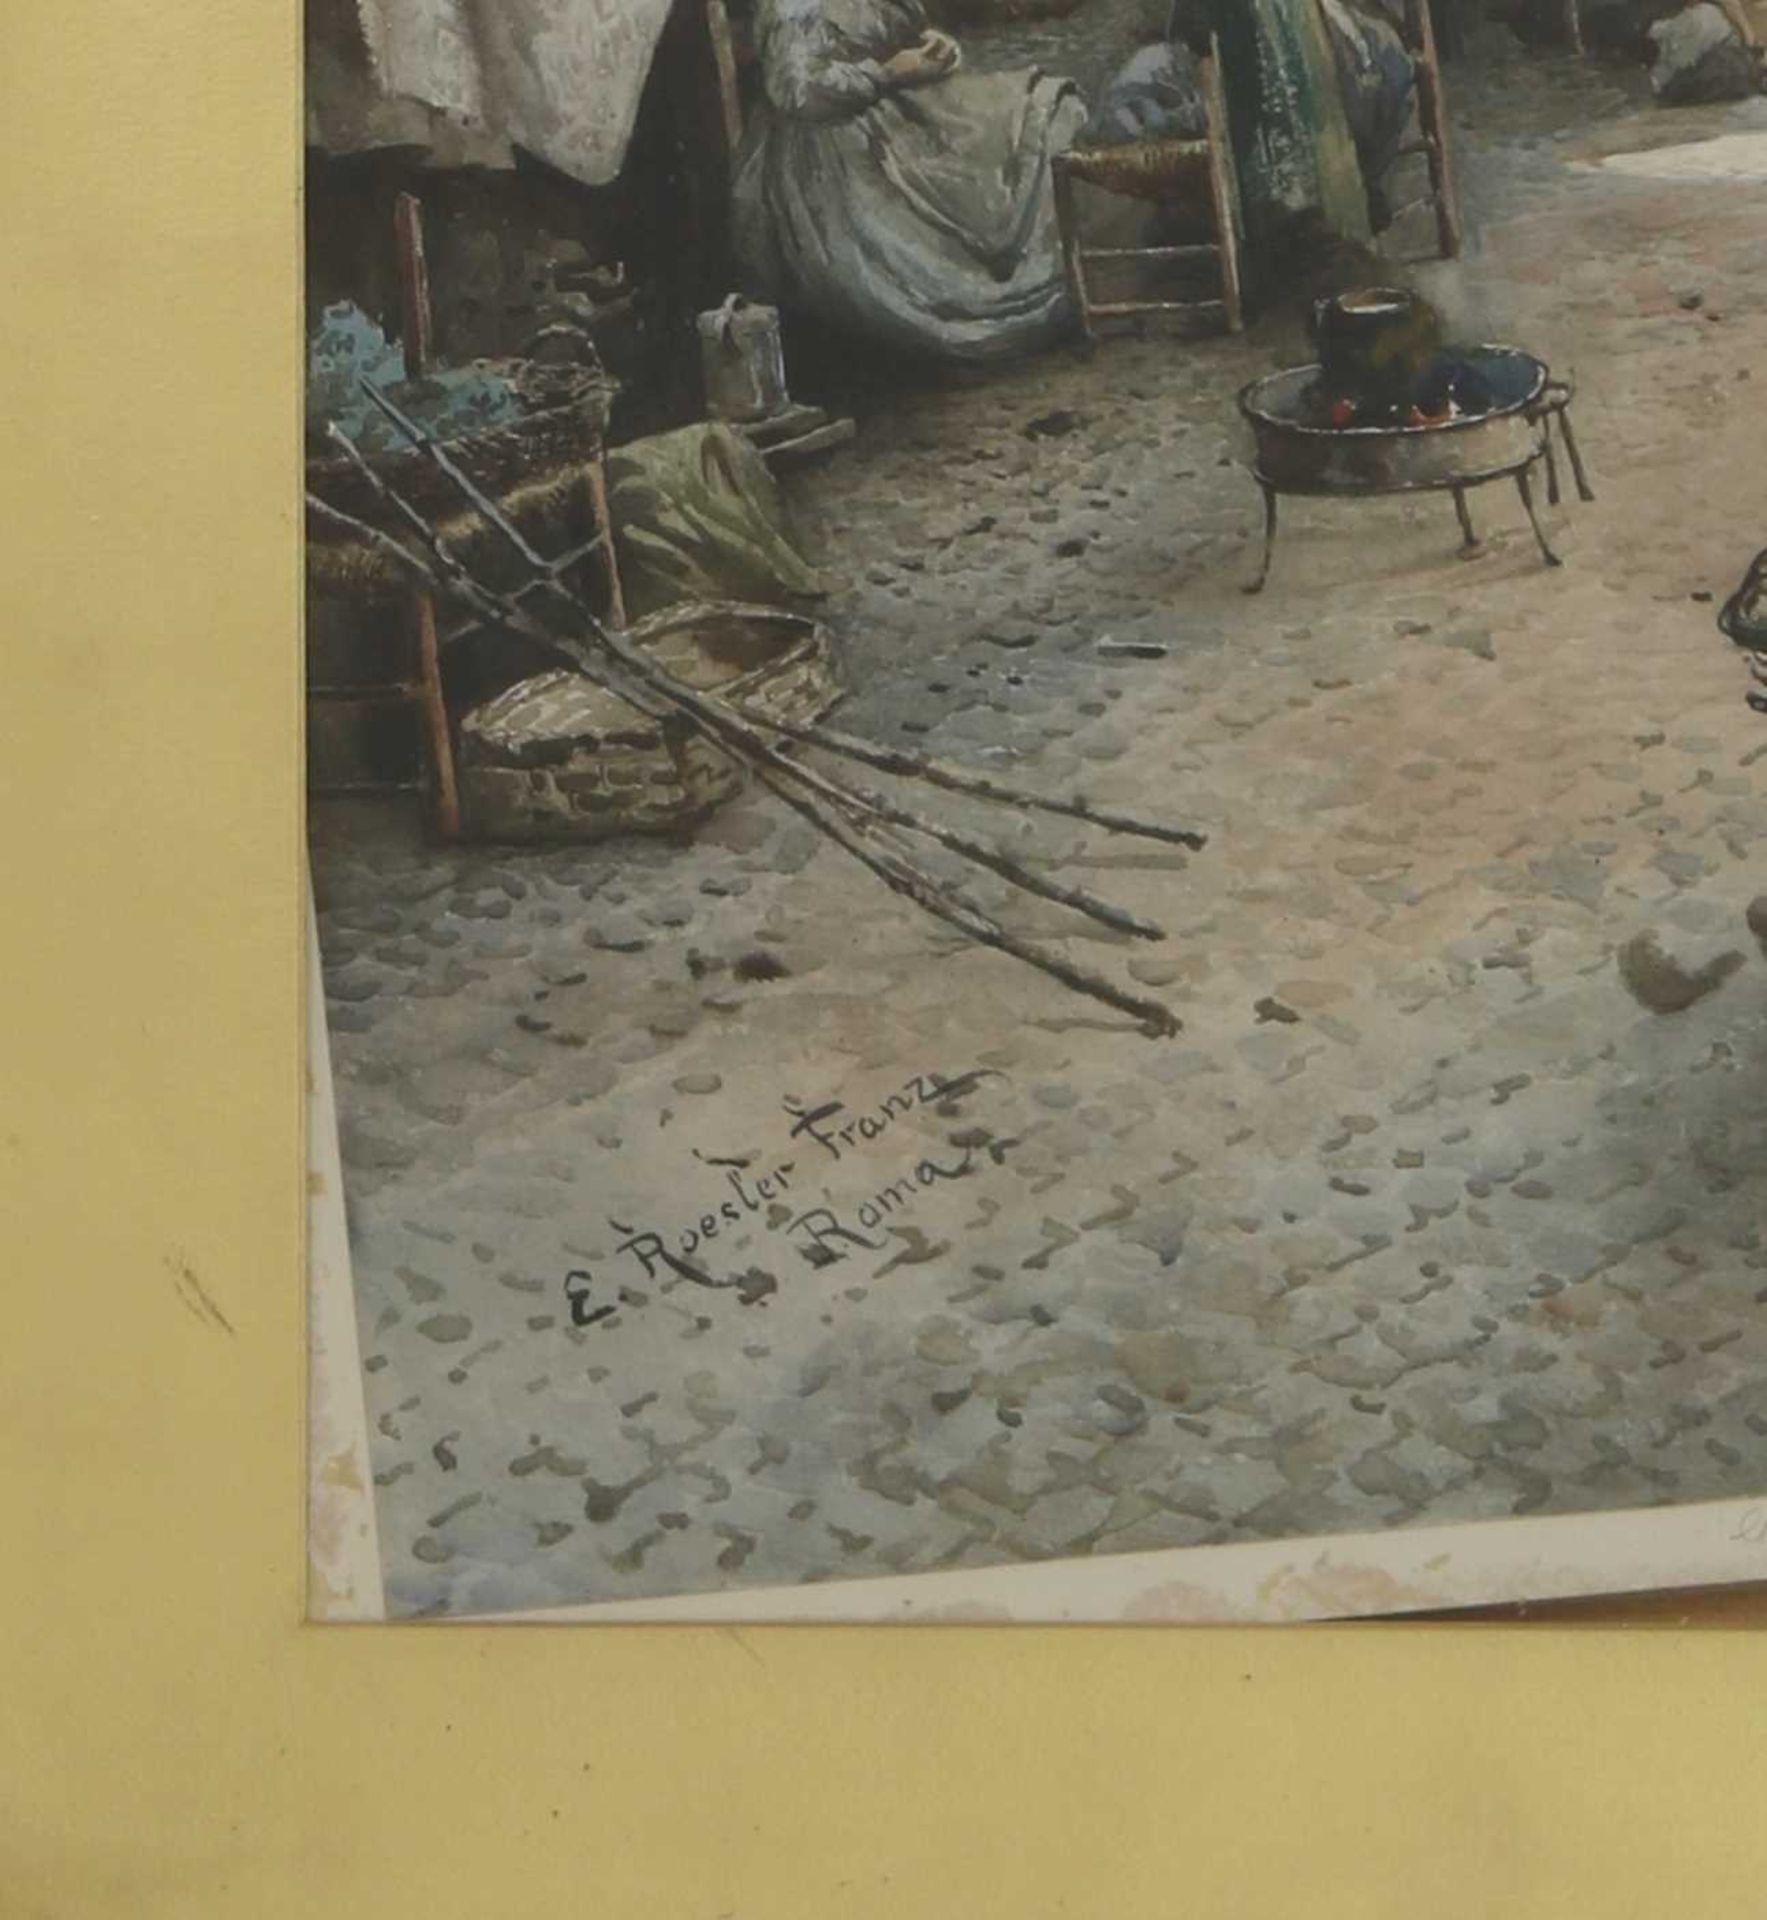 Ettore Roesler Franz (Italian, 1845-1907) - Image 6 of 10